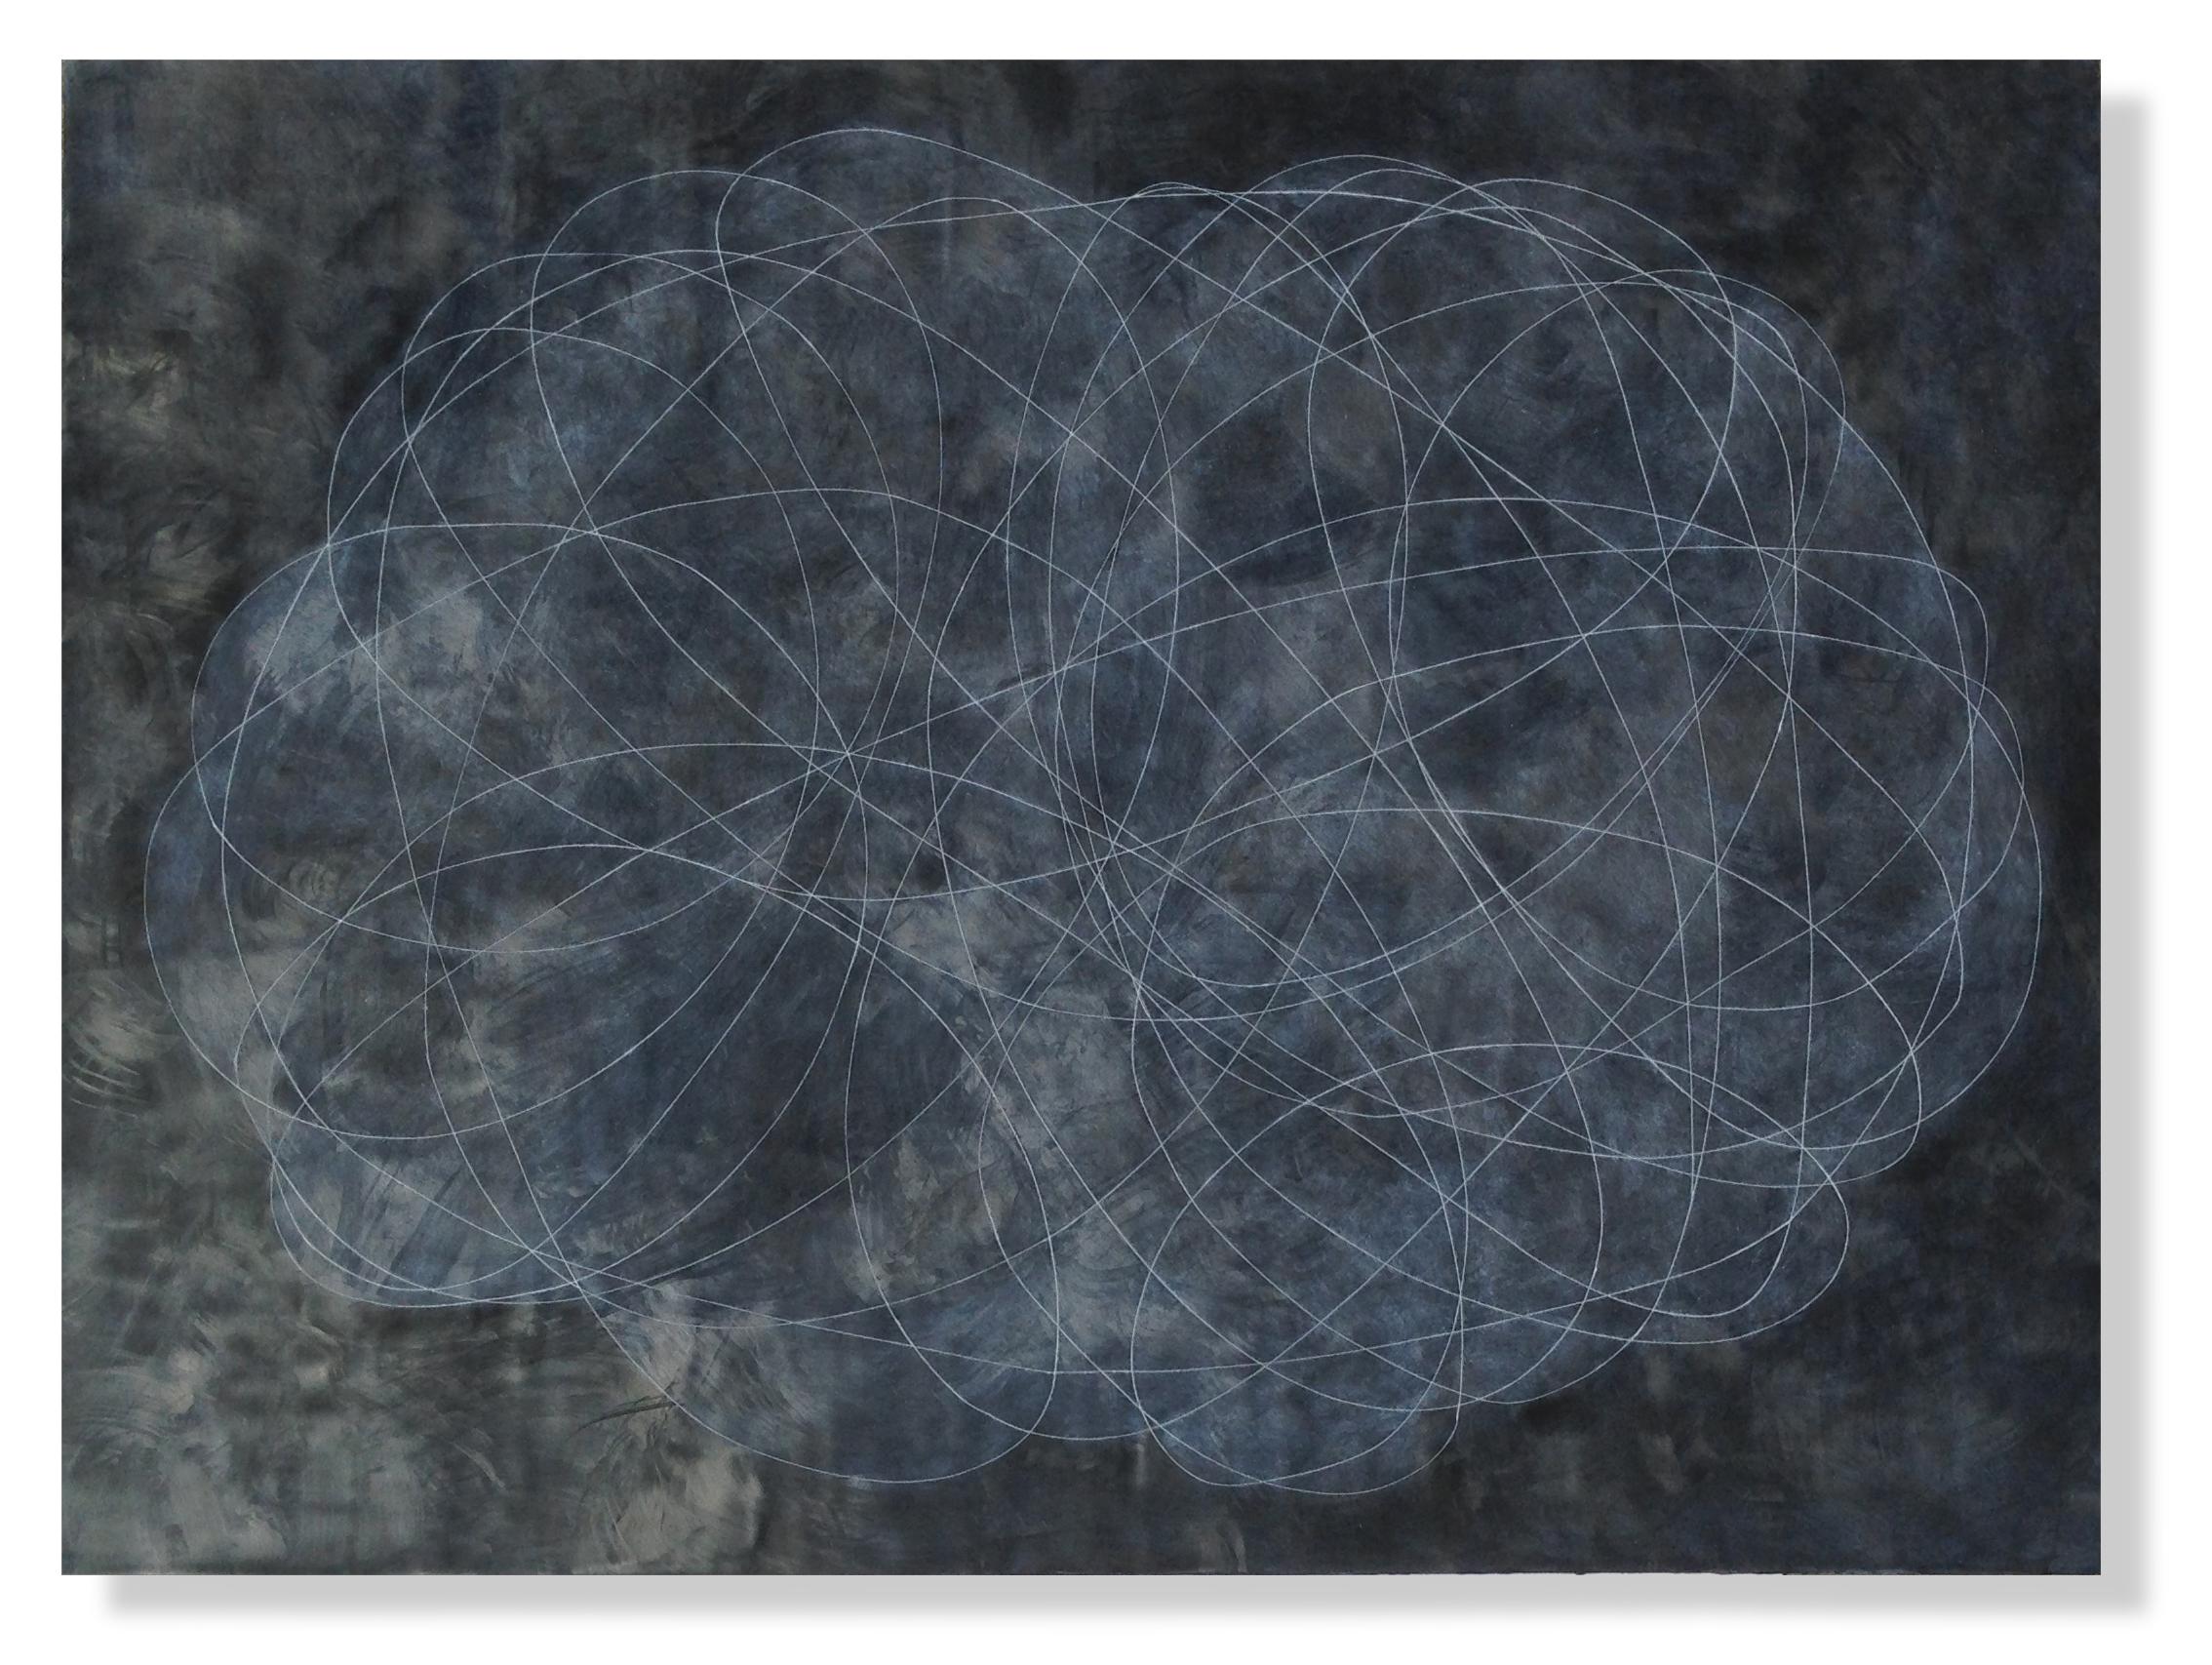 "Encircle 3, 2015 Encaustic, Mulberry Paper, Watercolor 4' x 3 x 2"" SOLD"